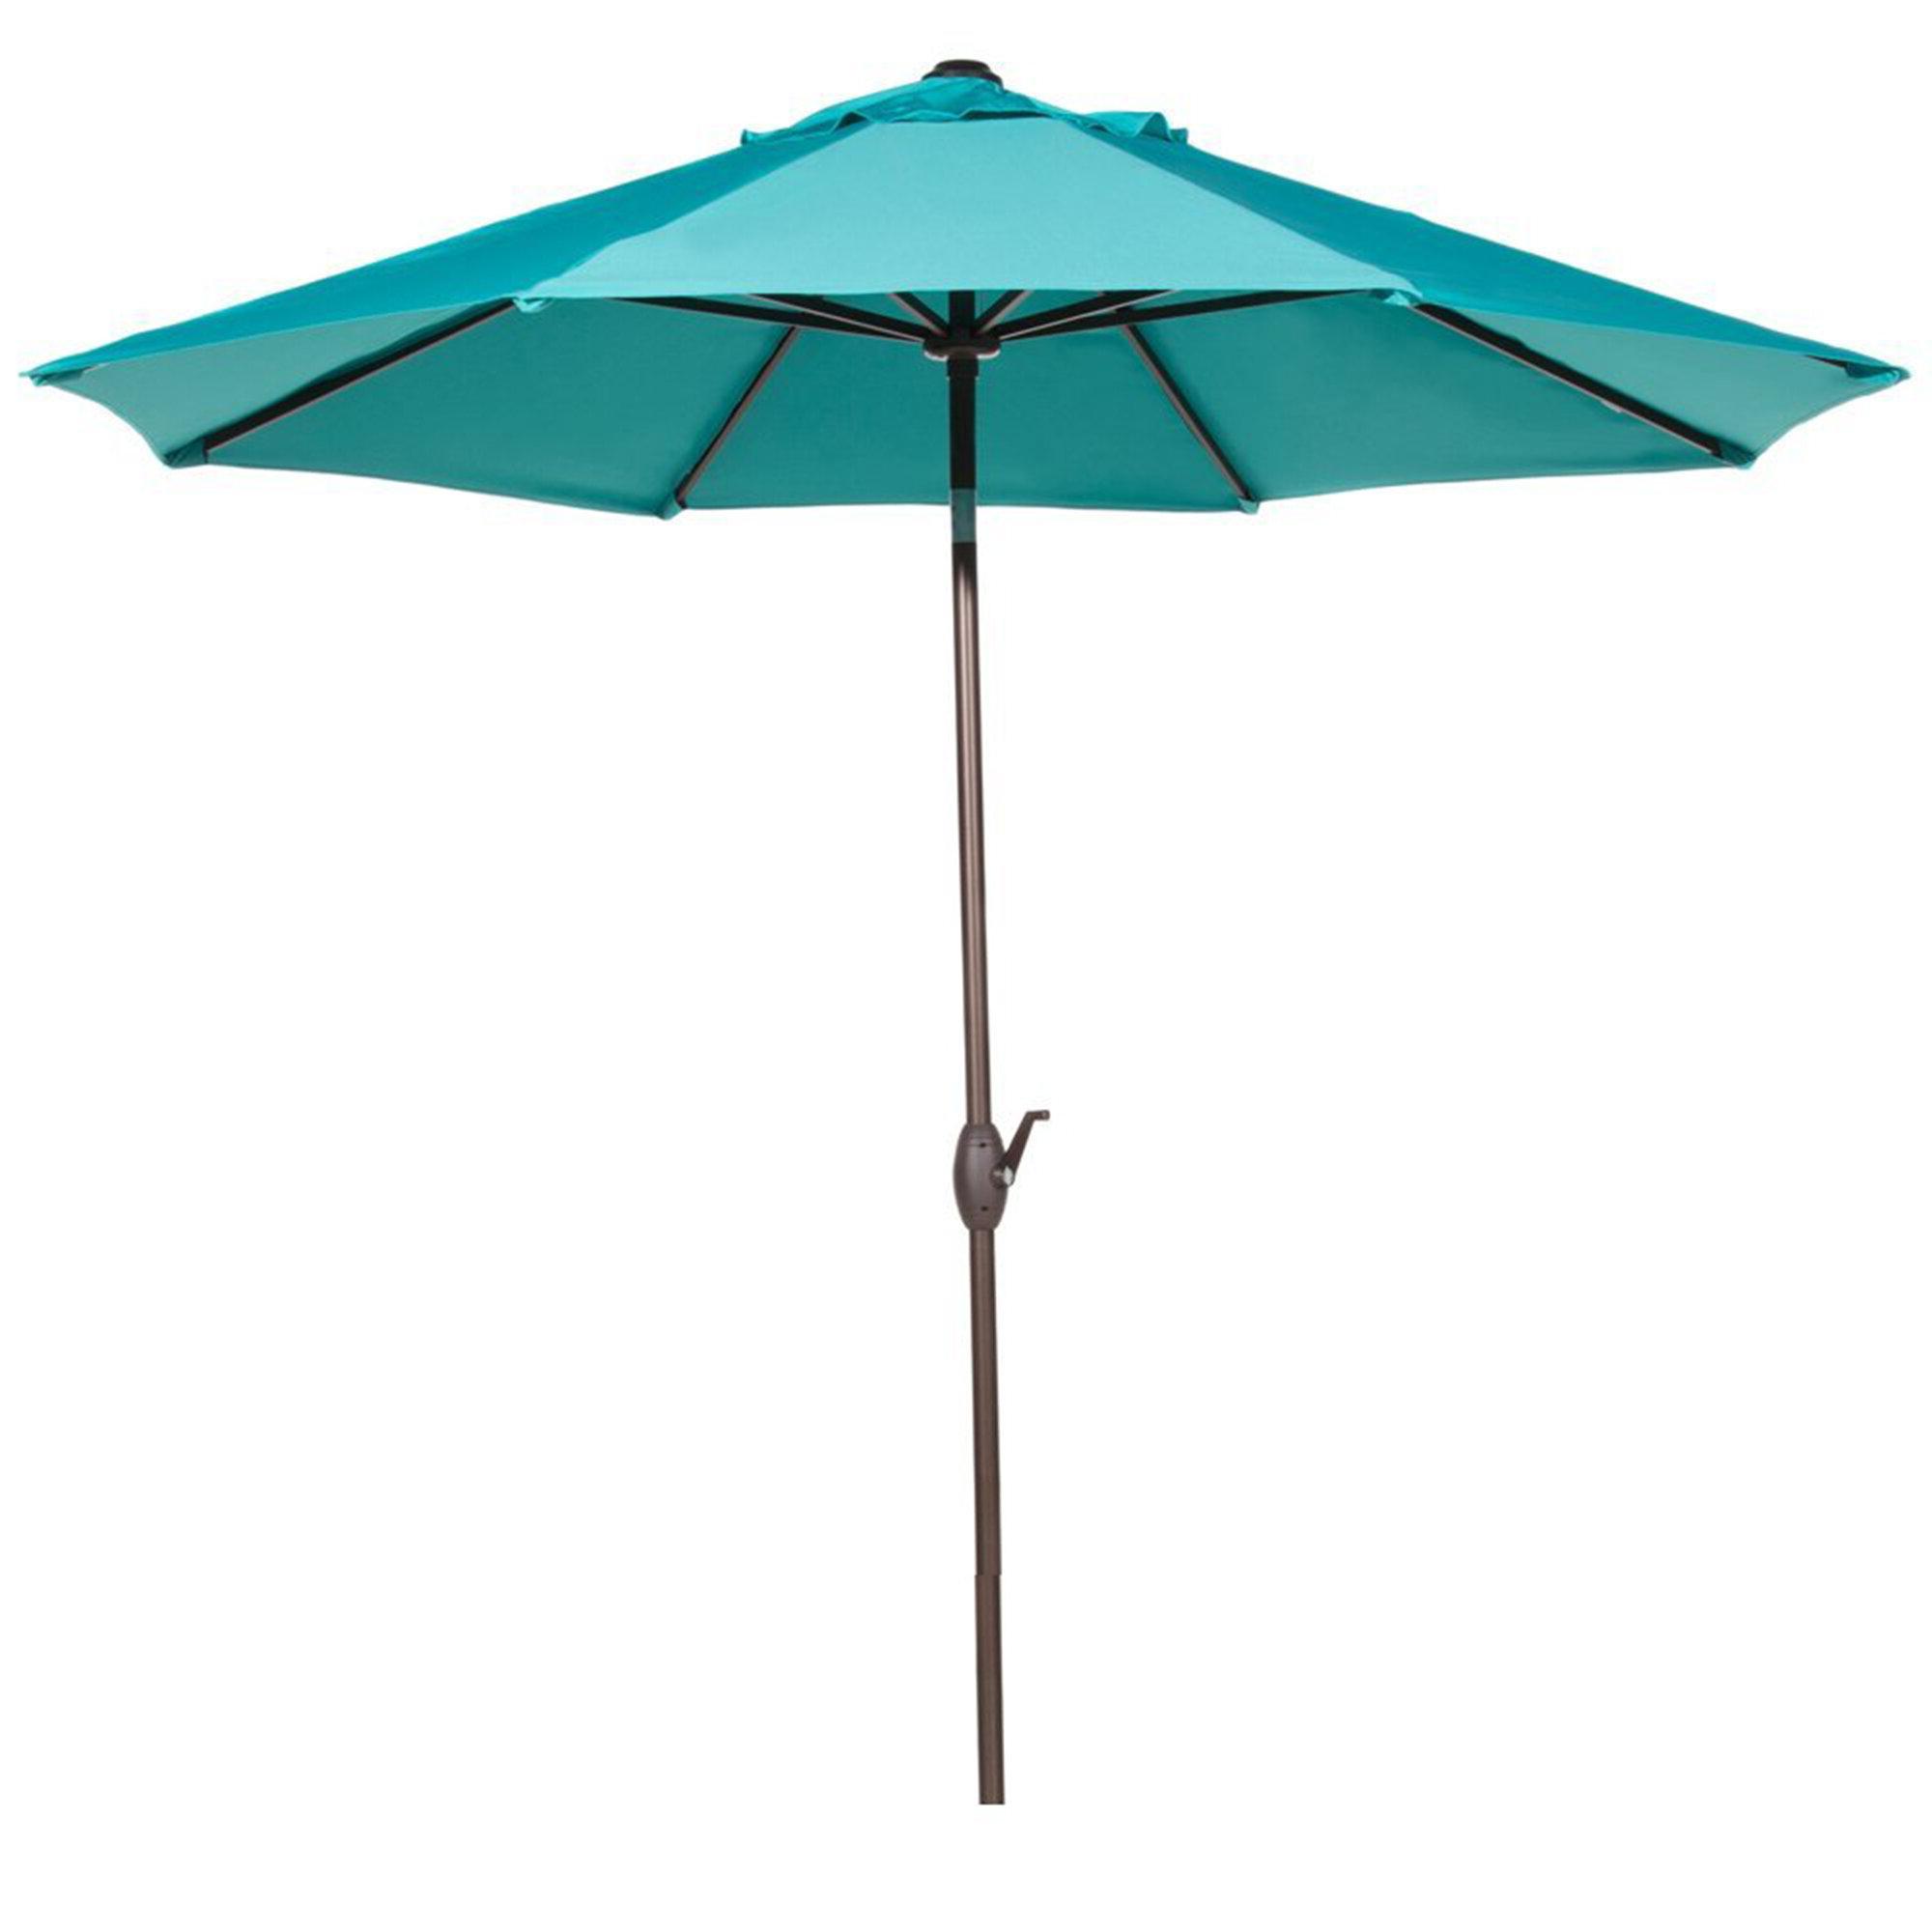 Preferred Delaplaine Market Umbrellas Intended For Winchester Zipcode Design 9' Market Umbrella (View 11 of 20)